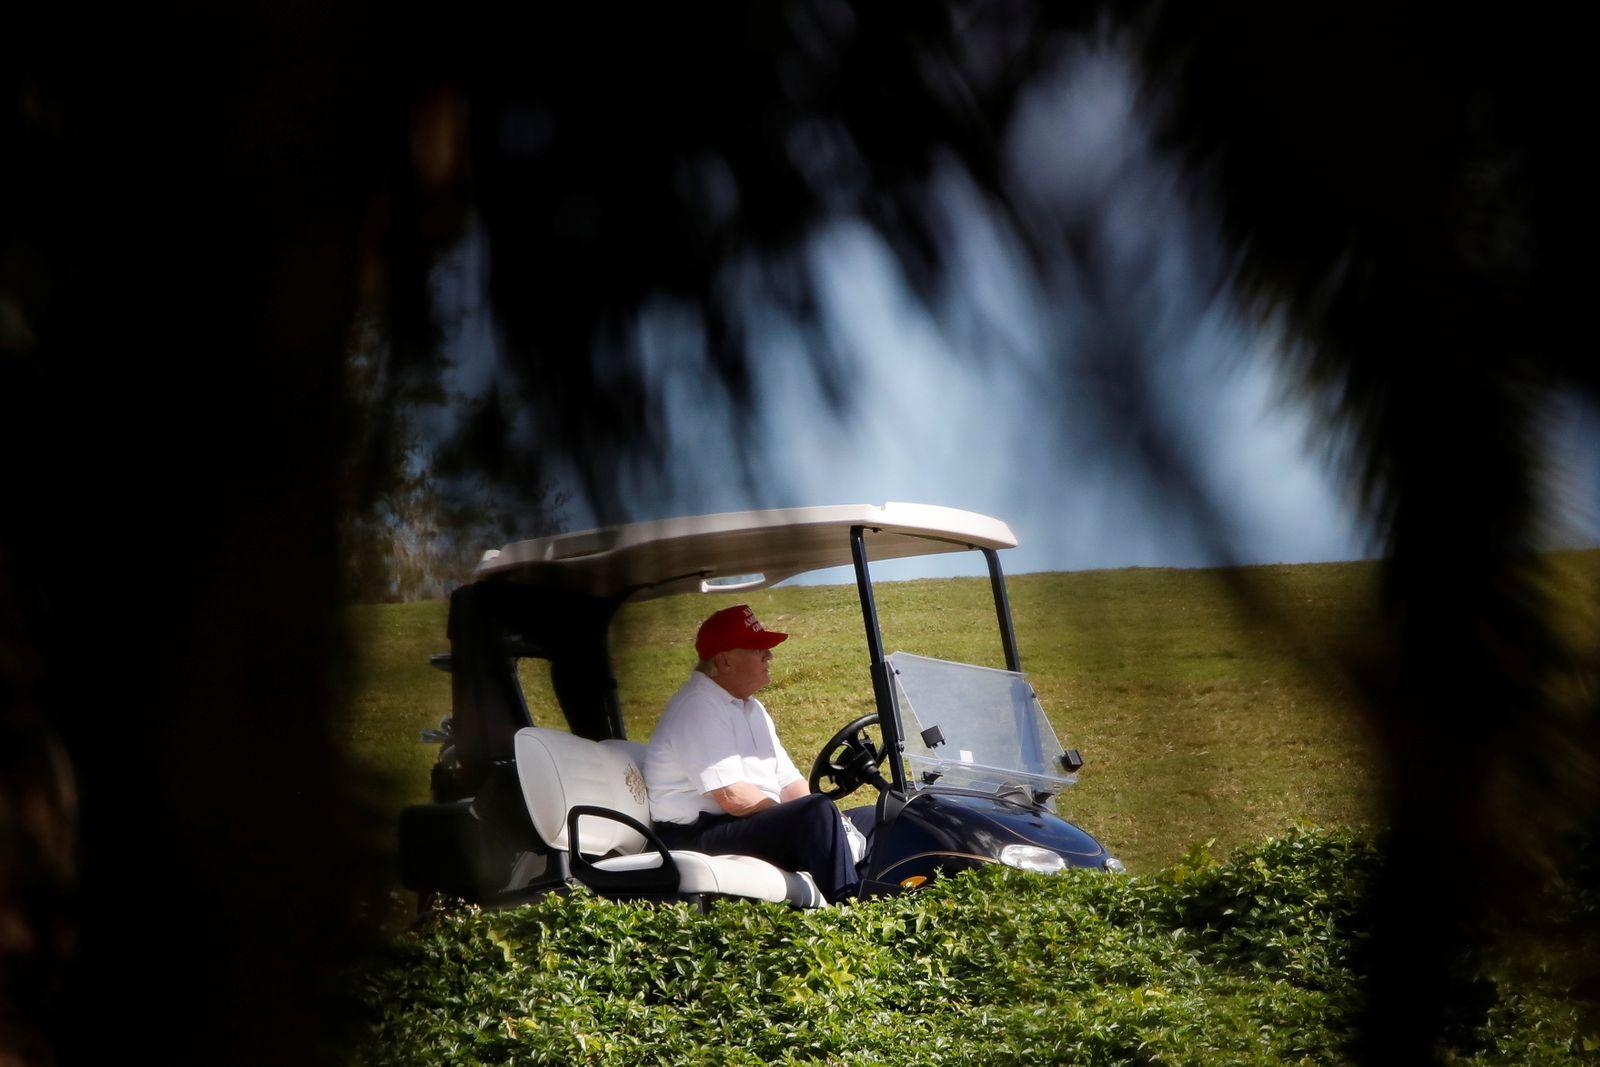 U.S. President Donald Trump plays golf at the Trump International Golf Club in West Palm Beach